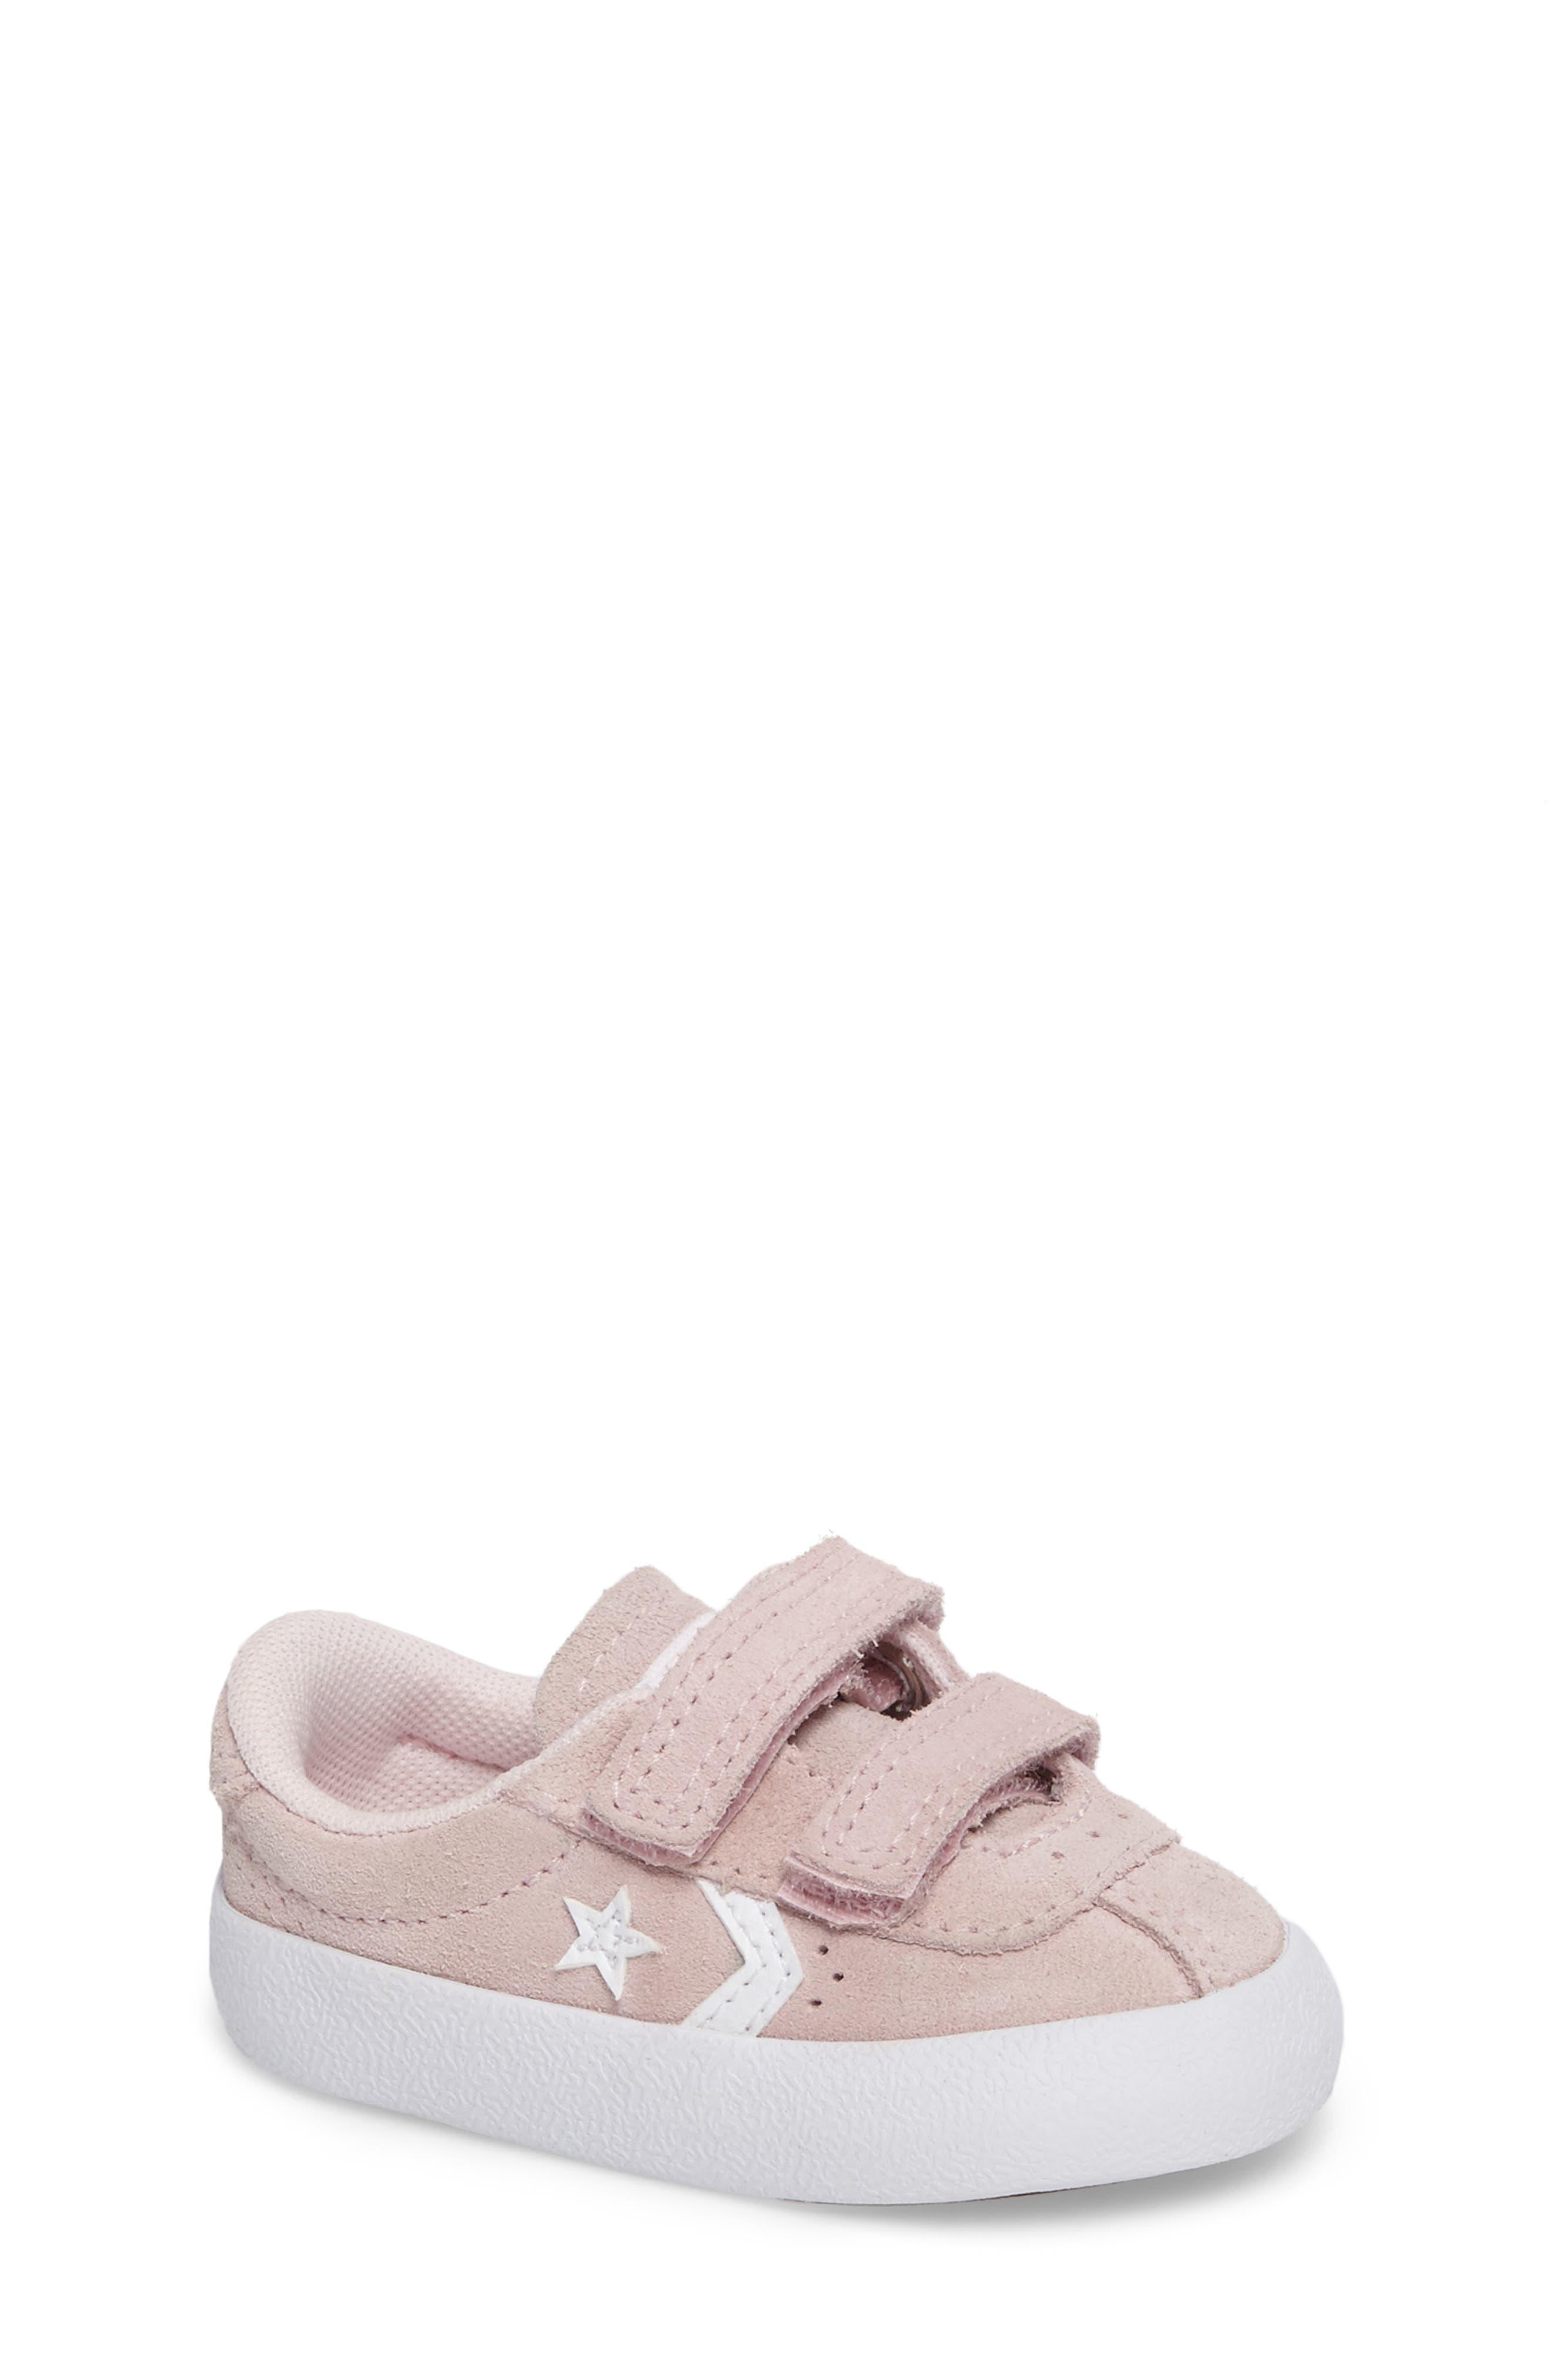 Converse Breakpoint Sneaker (Baby, Walker & Toddler)